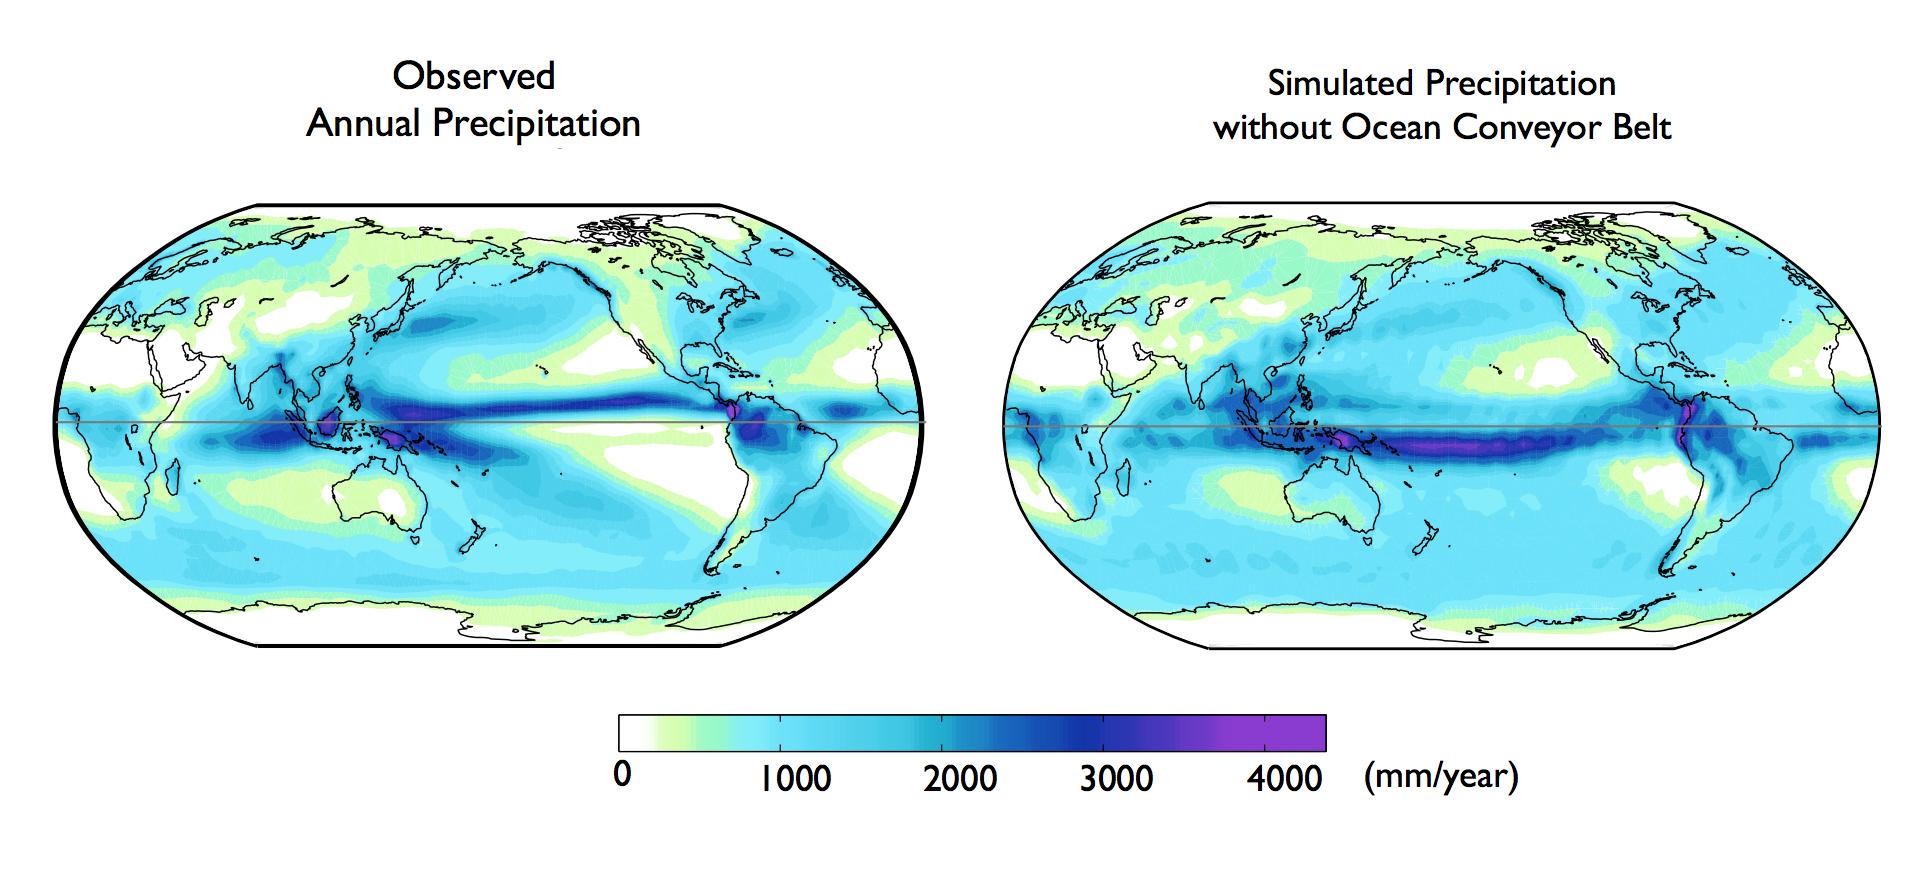 Global Ocean Currents Explain Why Northern Hemisphere Is